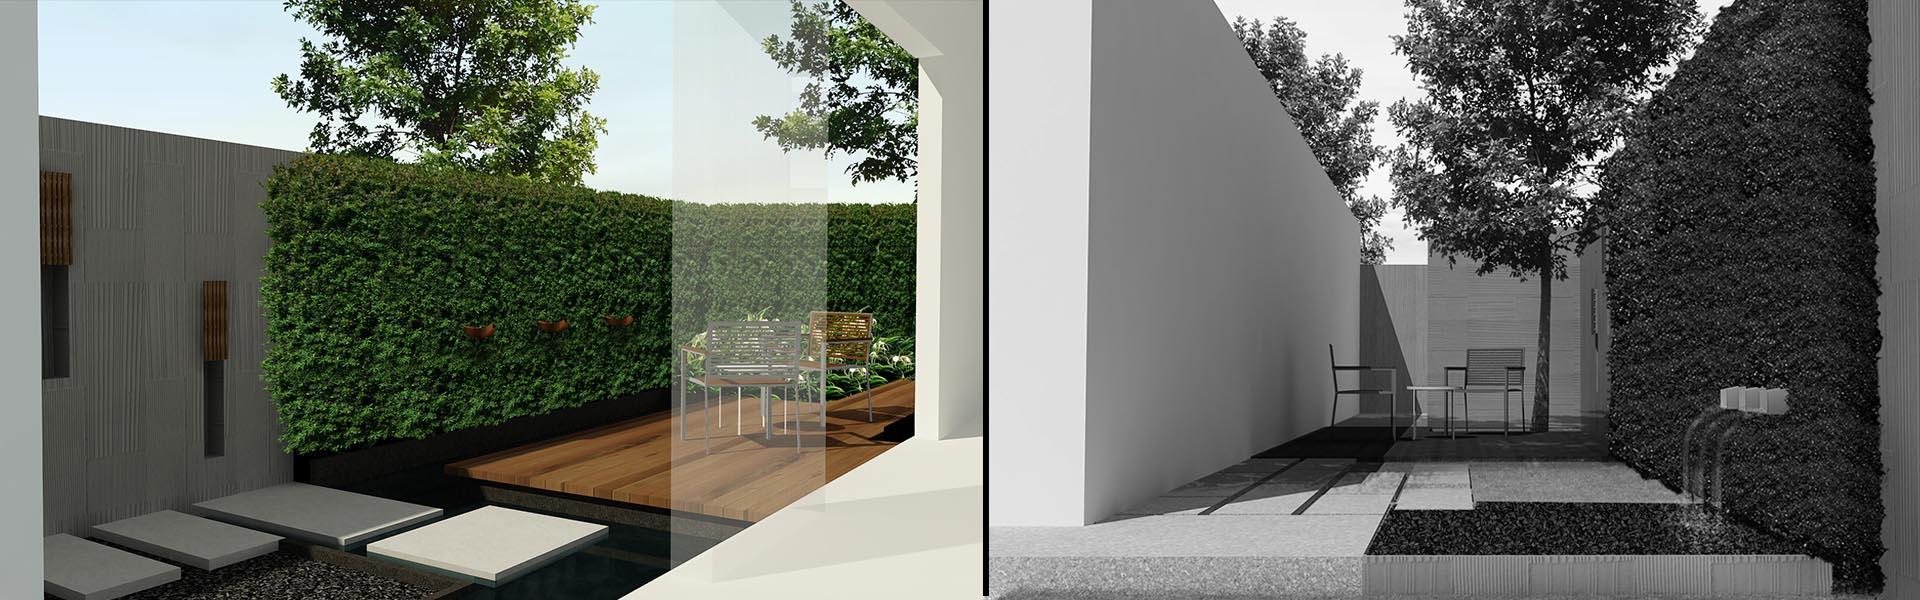 Garden Design Malaysia kemensah hevea garden, malaysia » inside out design co., ltd